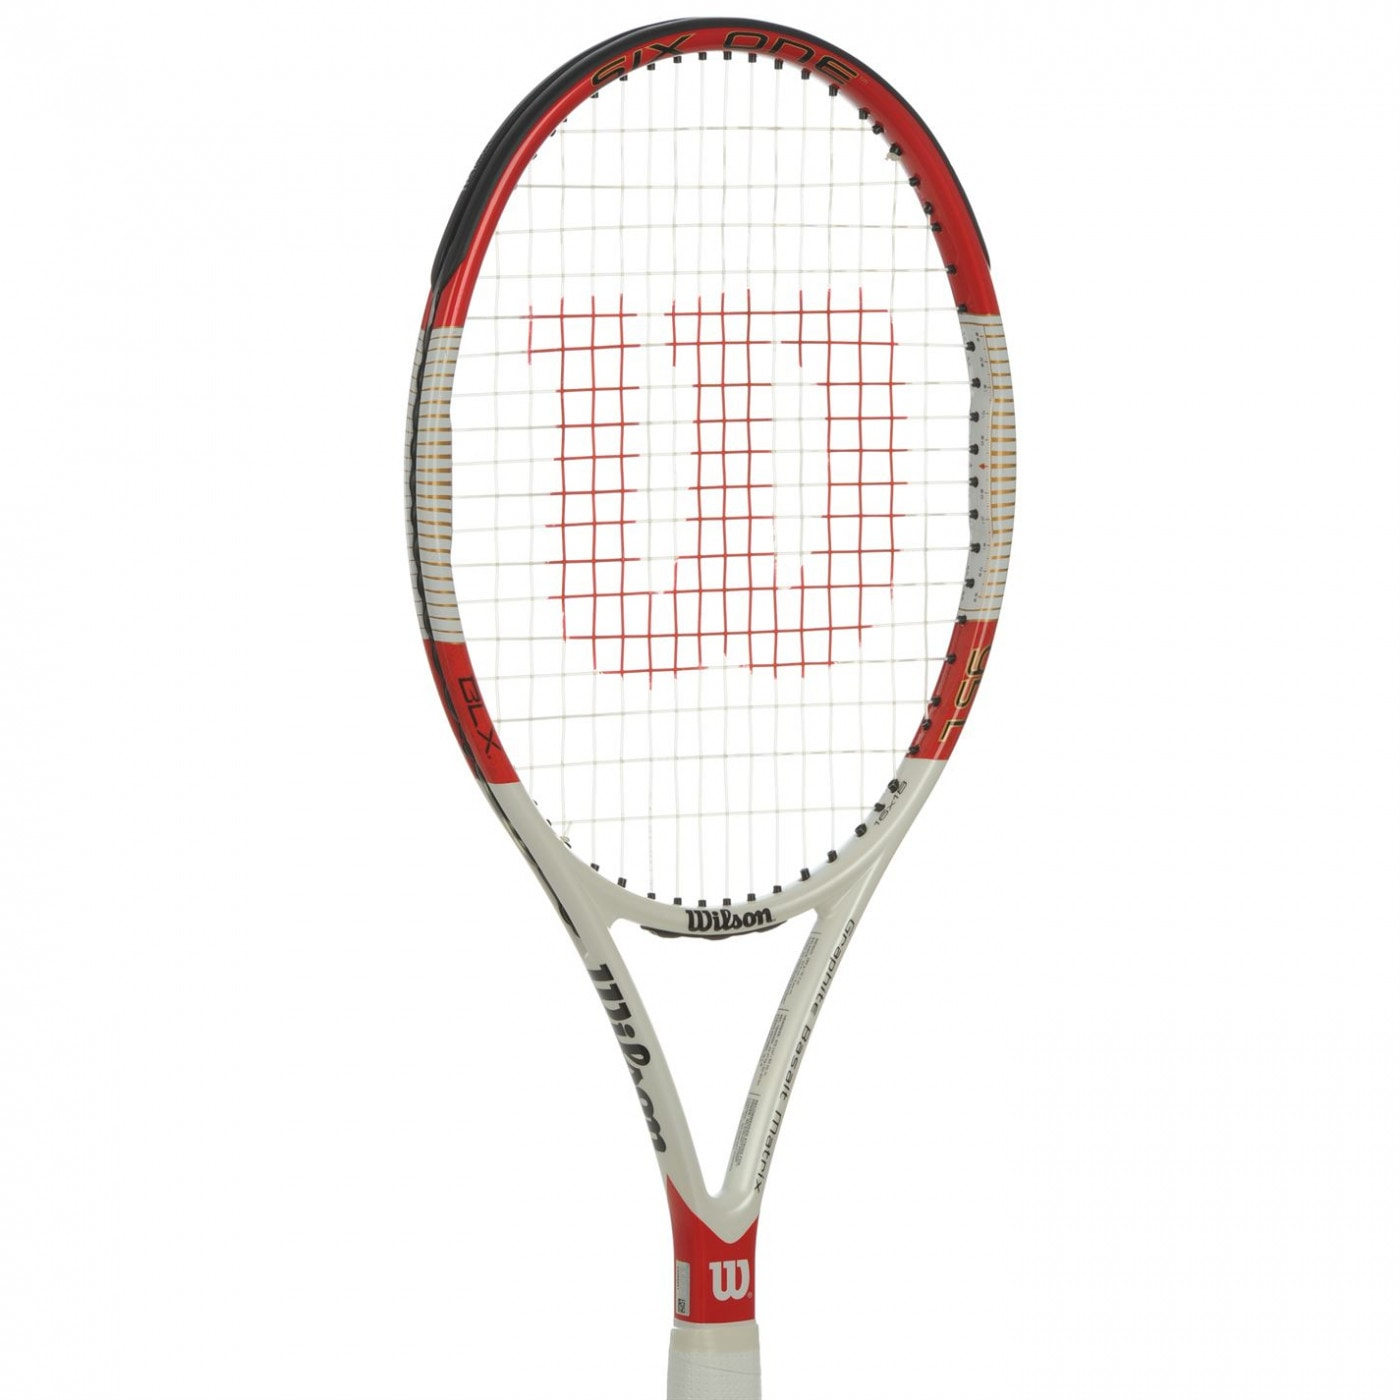 Wilson 6.1 95L Tennis Racket